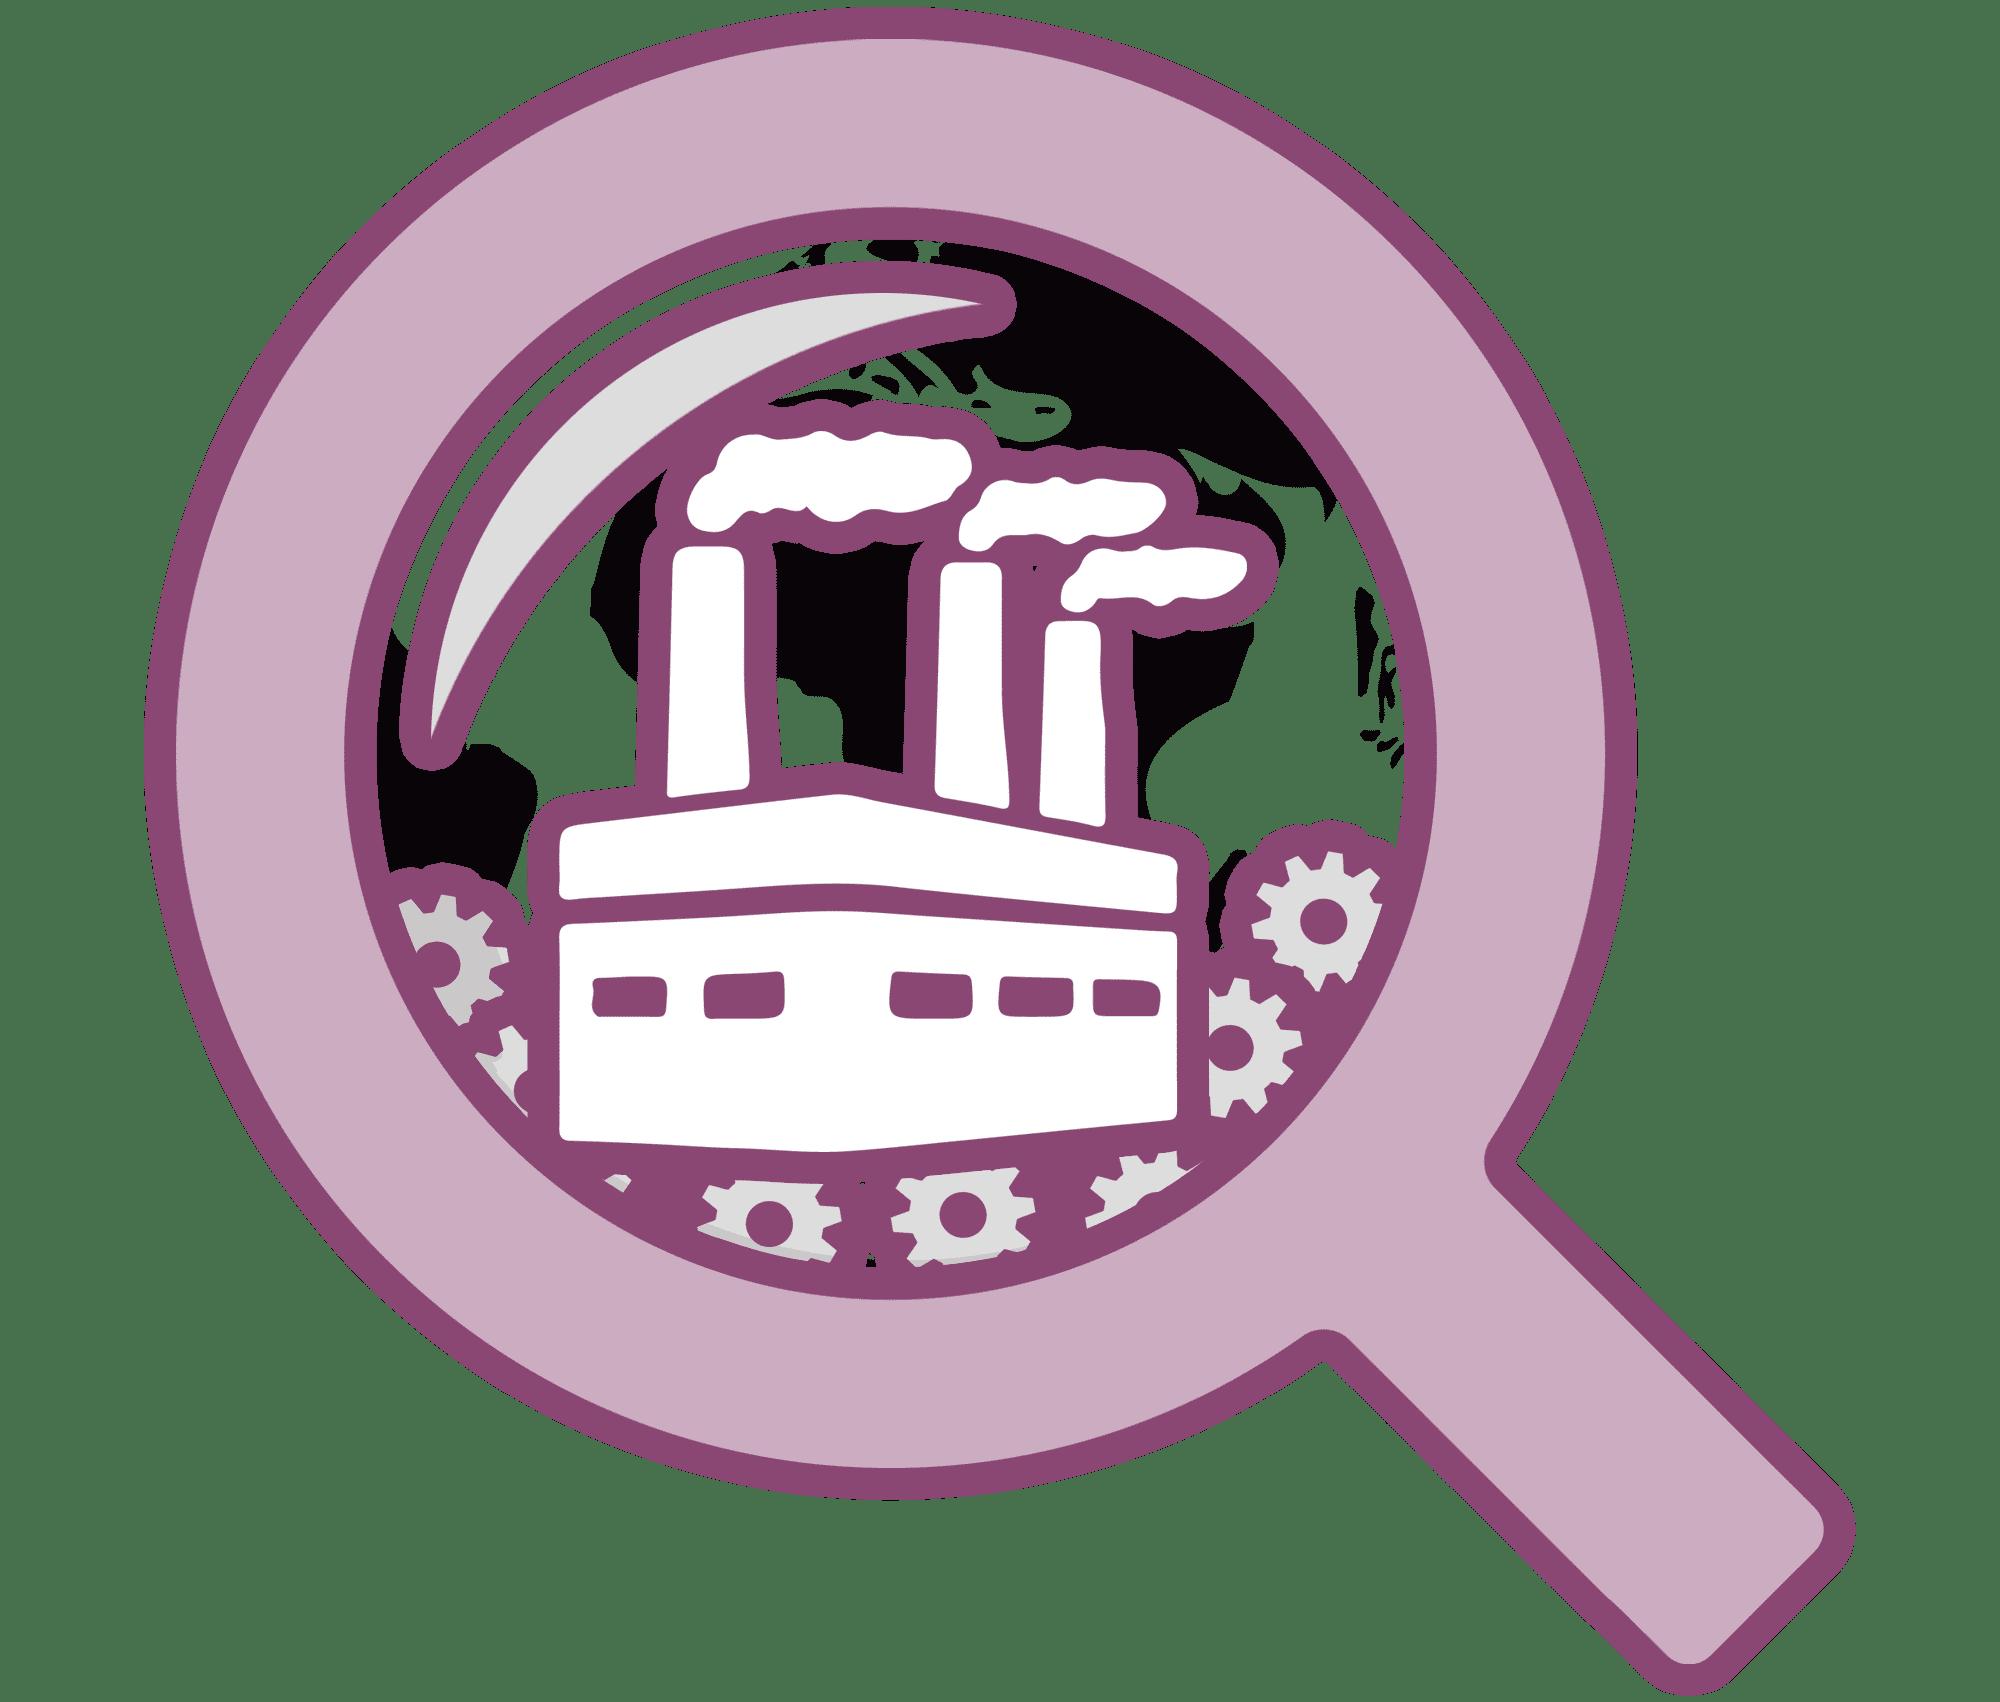 industrial search engine optimization illustration